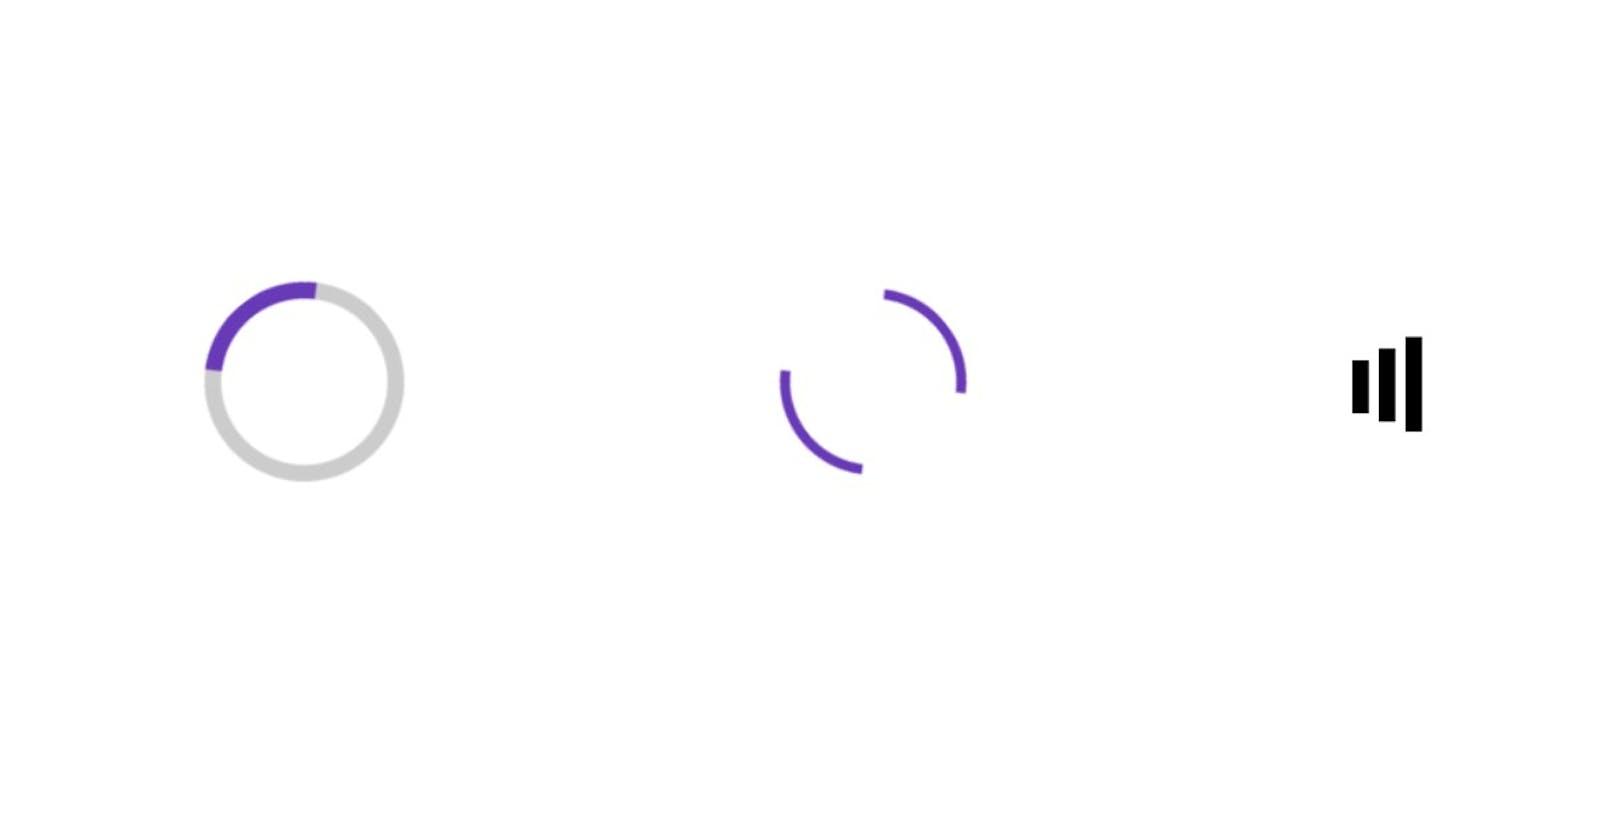 Loading animations in vanilla CSS